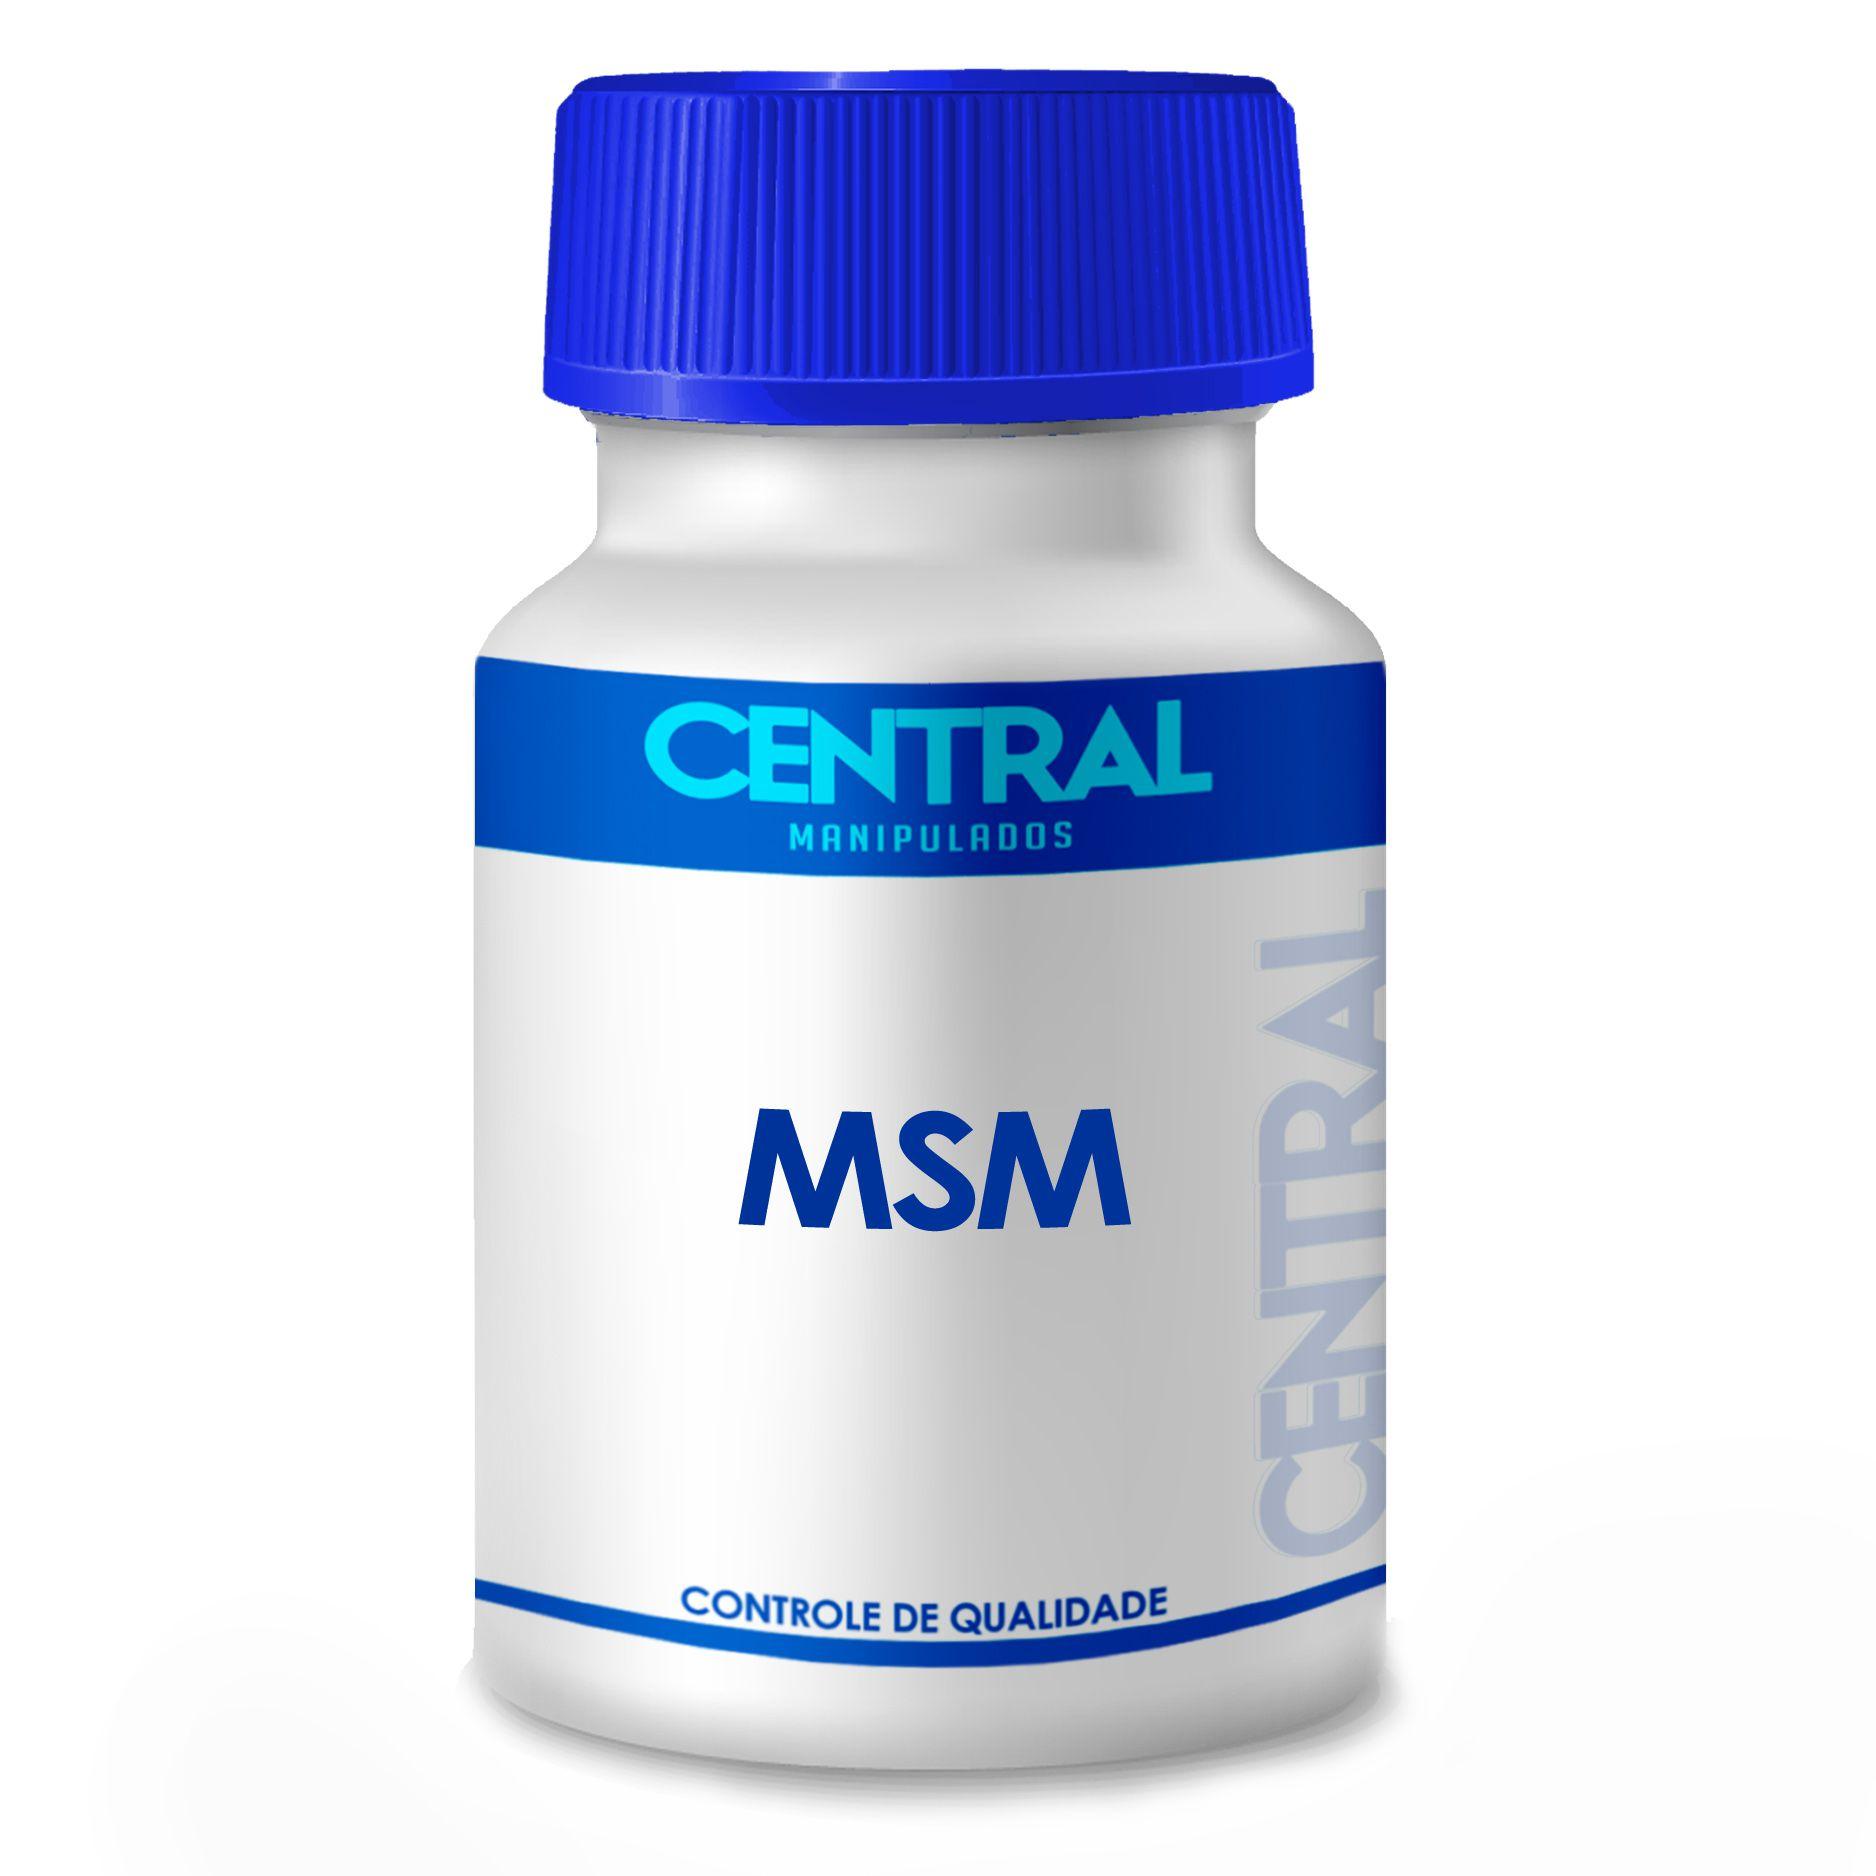 MSM - forma natural de enxofre orgânico - 500mg  - 120 cápsulas